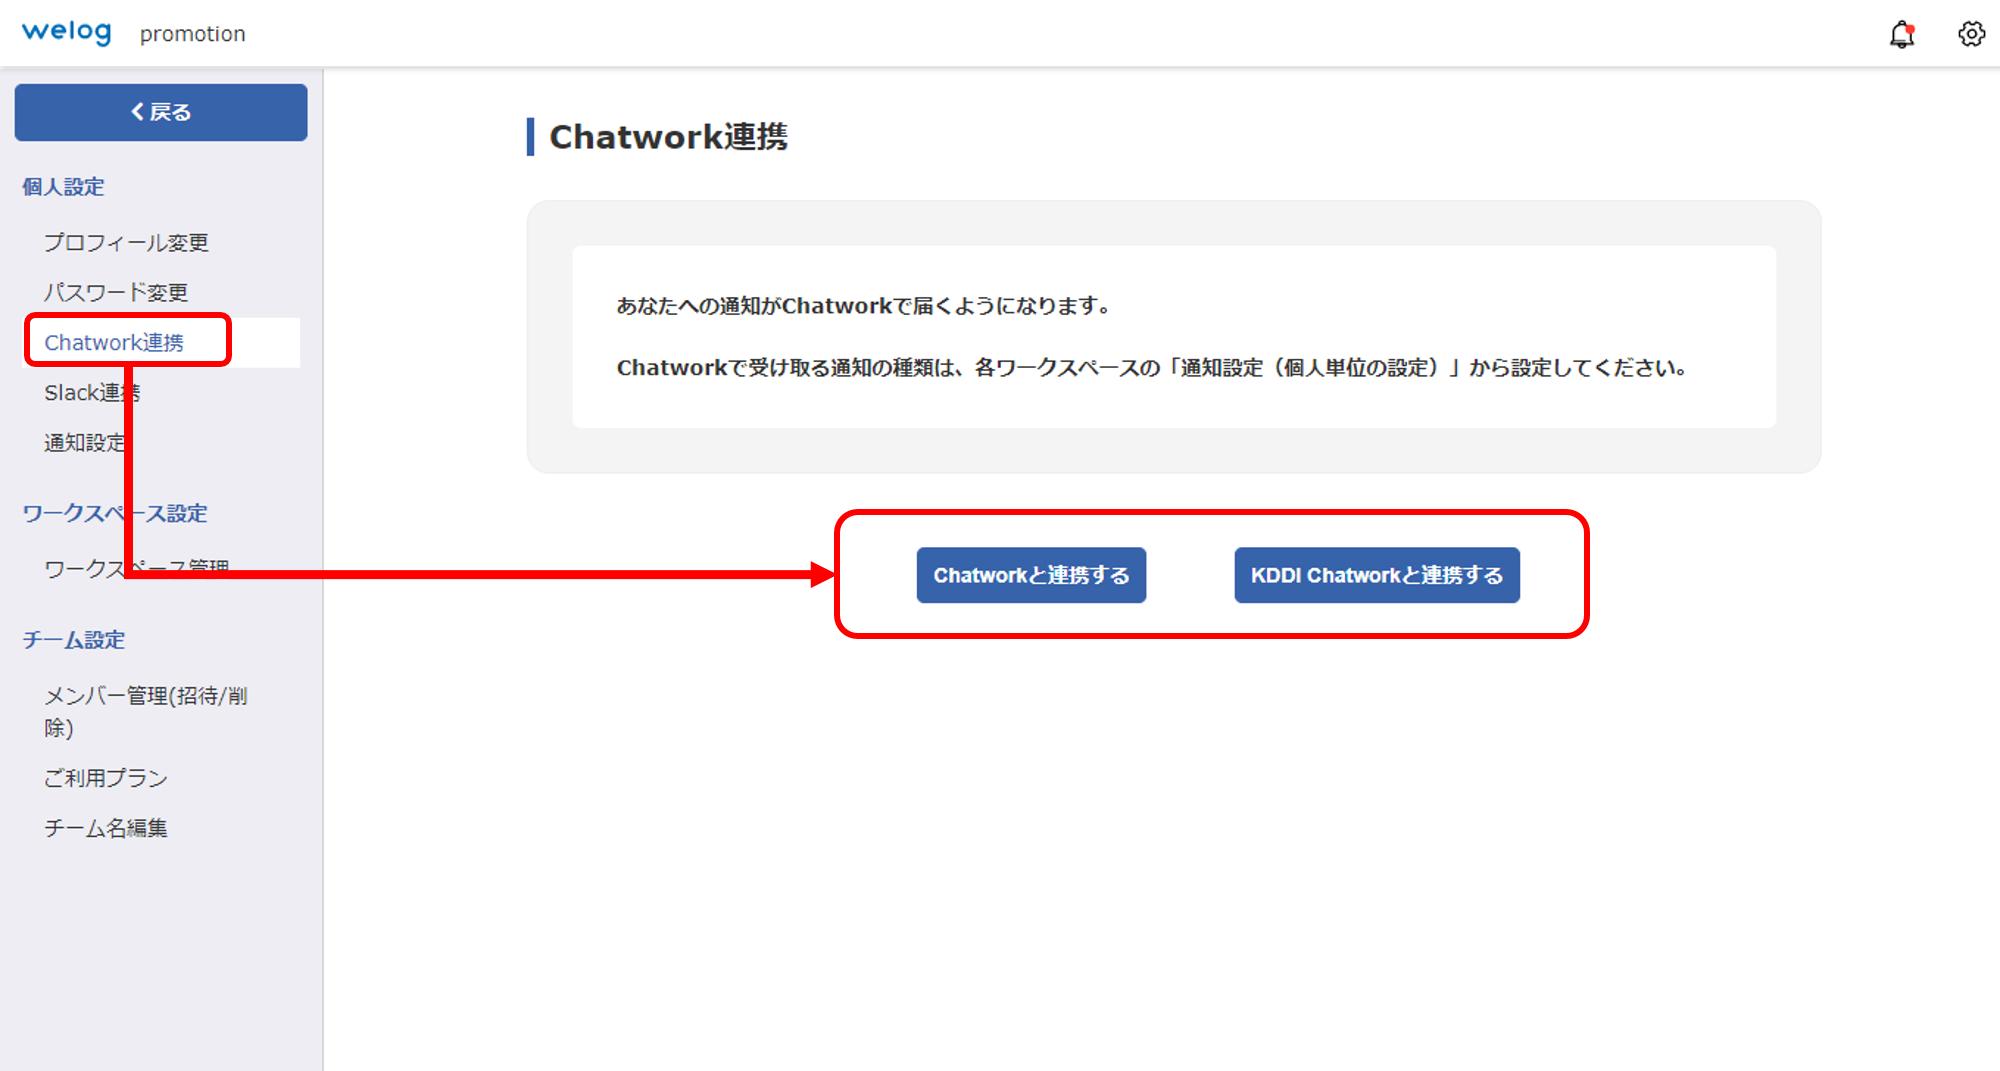 welog-Chatwork連携手順_2_FAQ掲載用.png